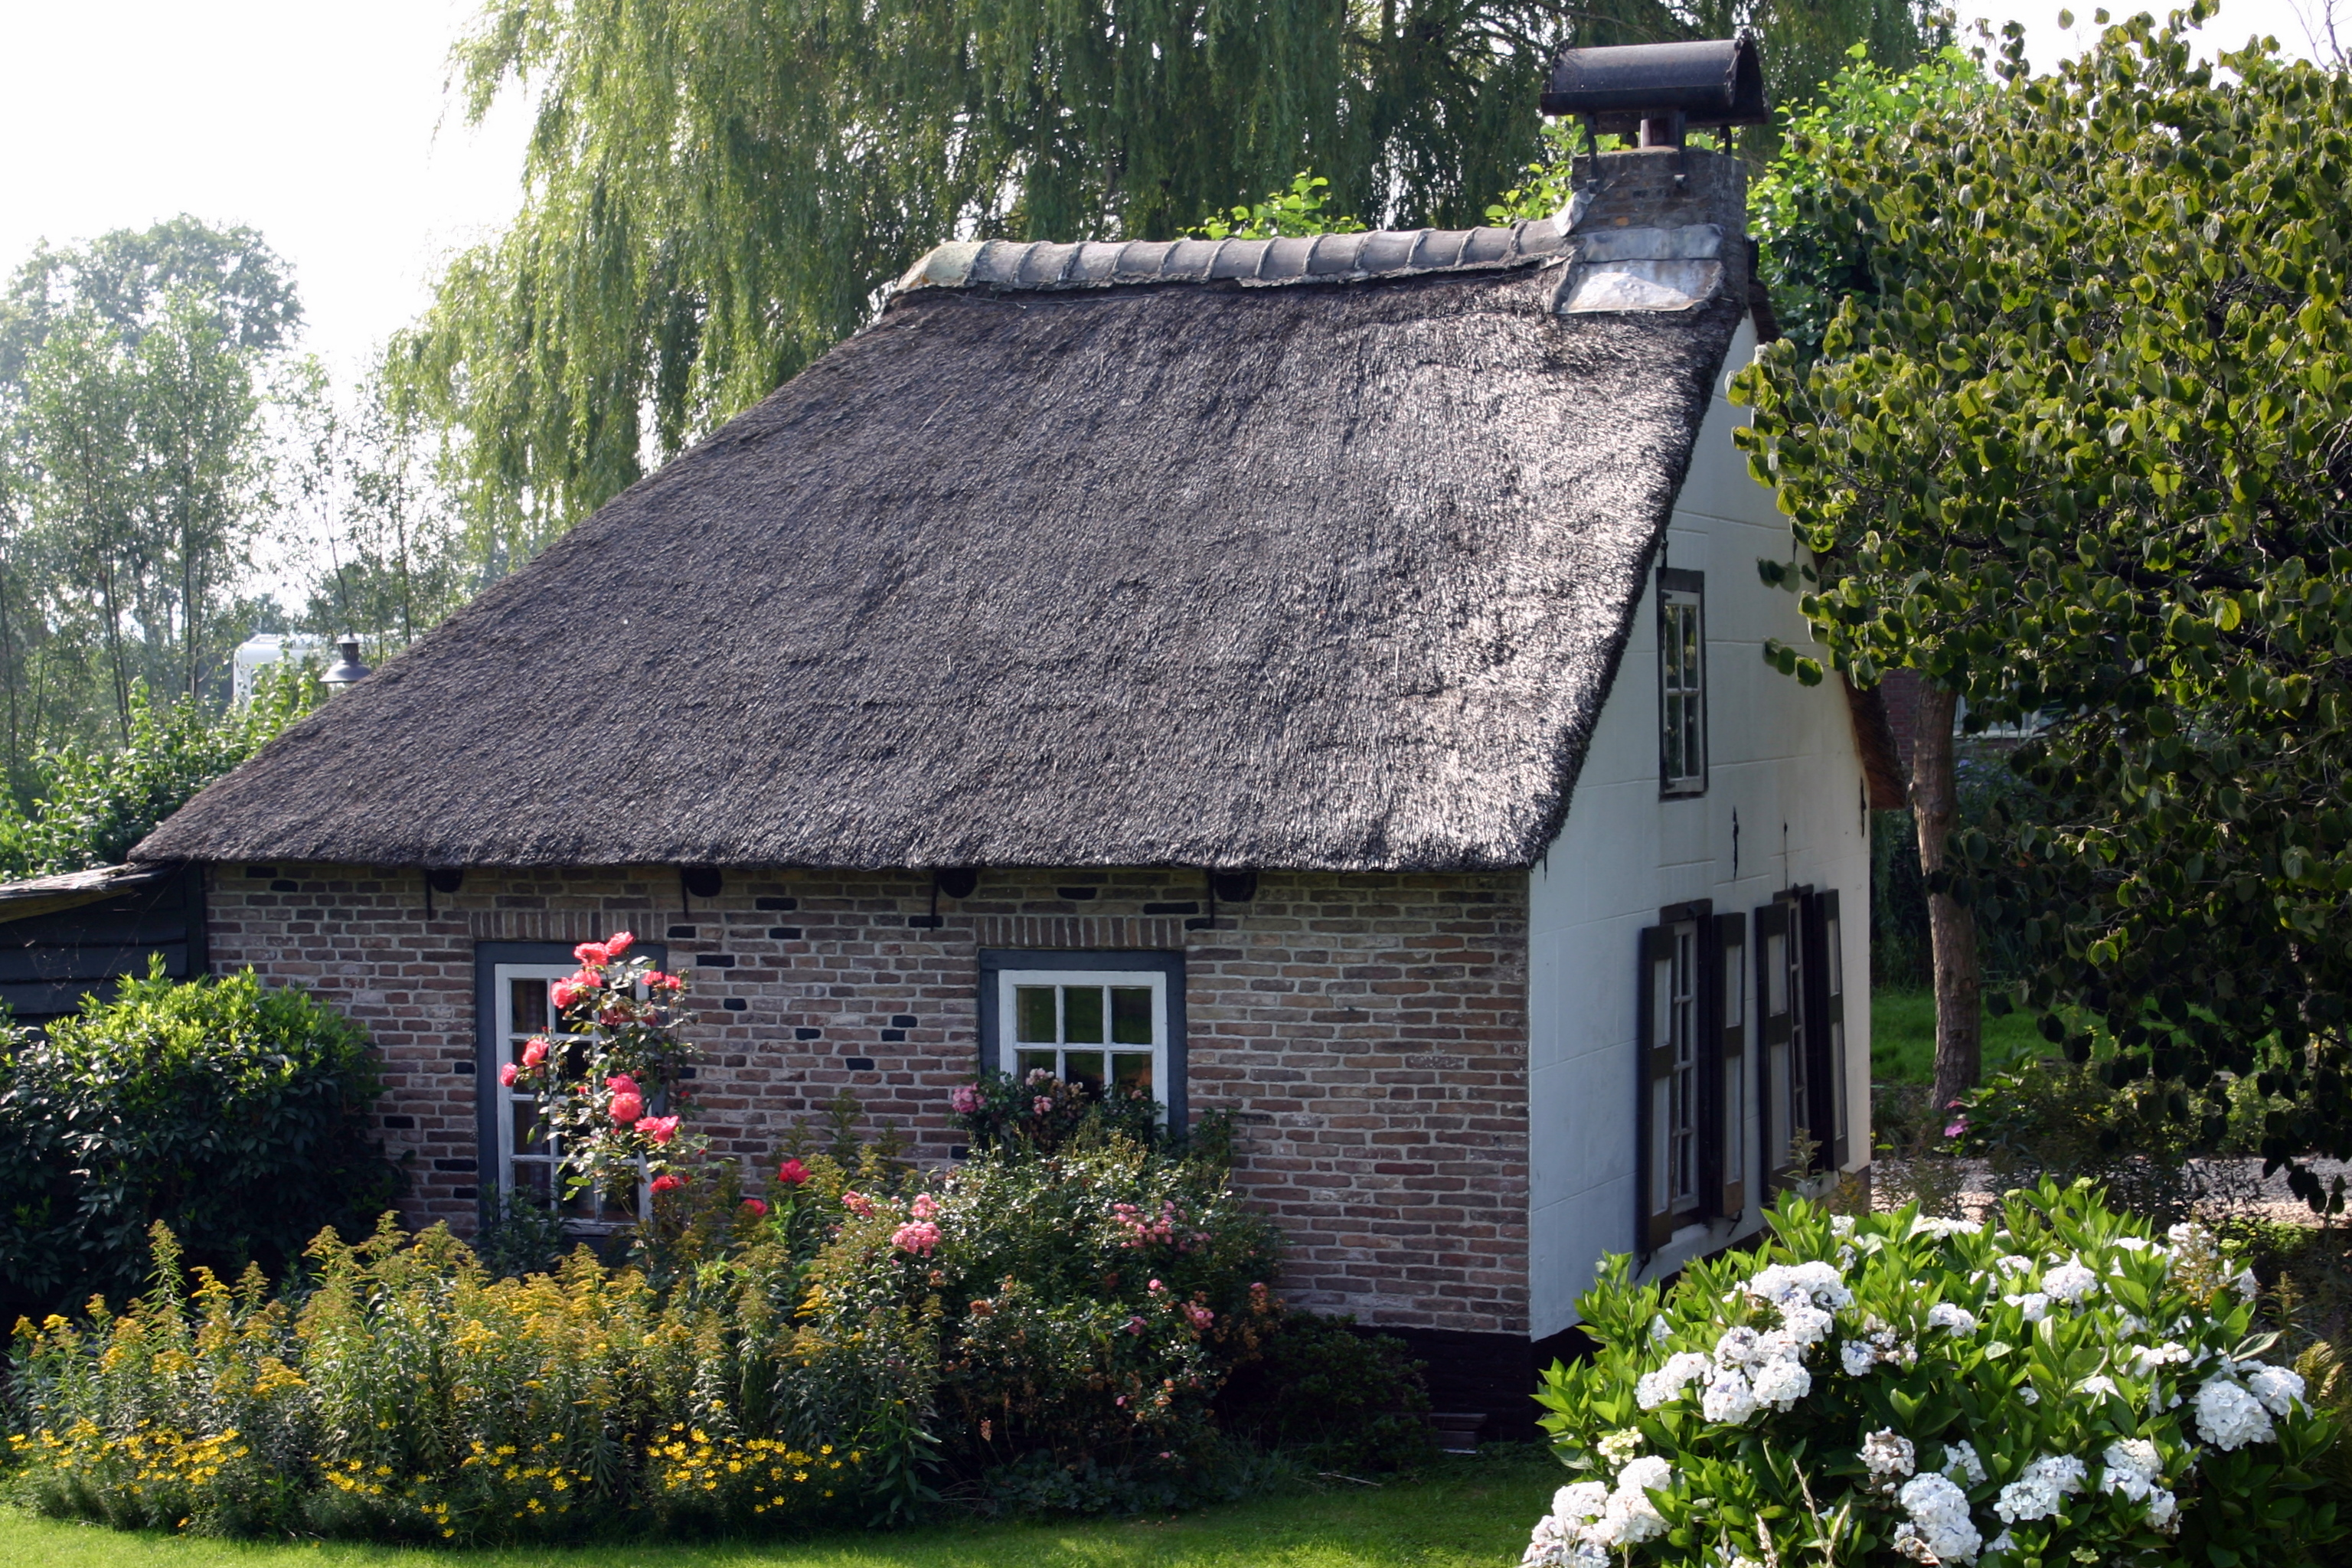 Kleine boerderij onder zadeldak met gepleisterde punt gevel waarin vensters met oude kozijnen - Oude huis gevel ...